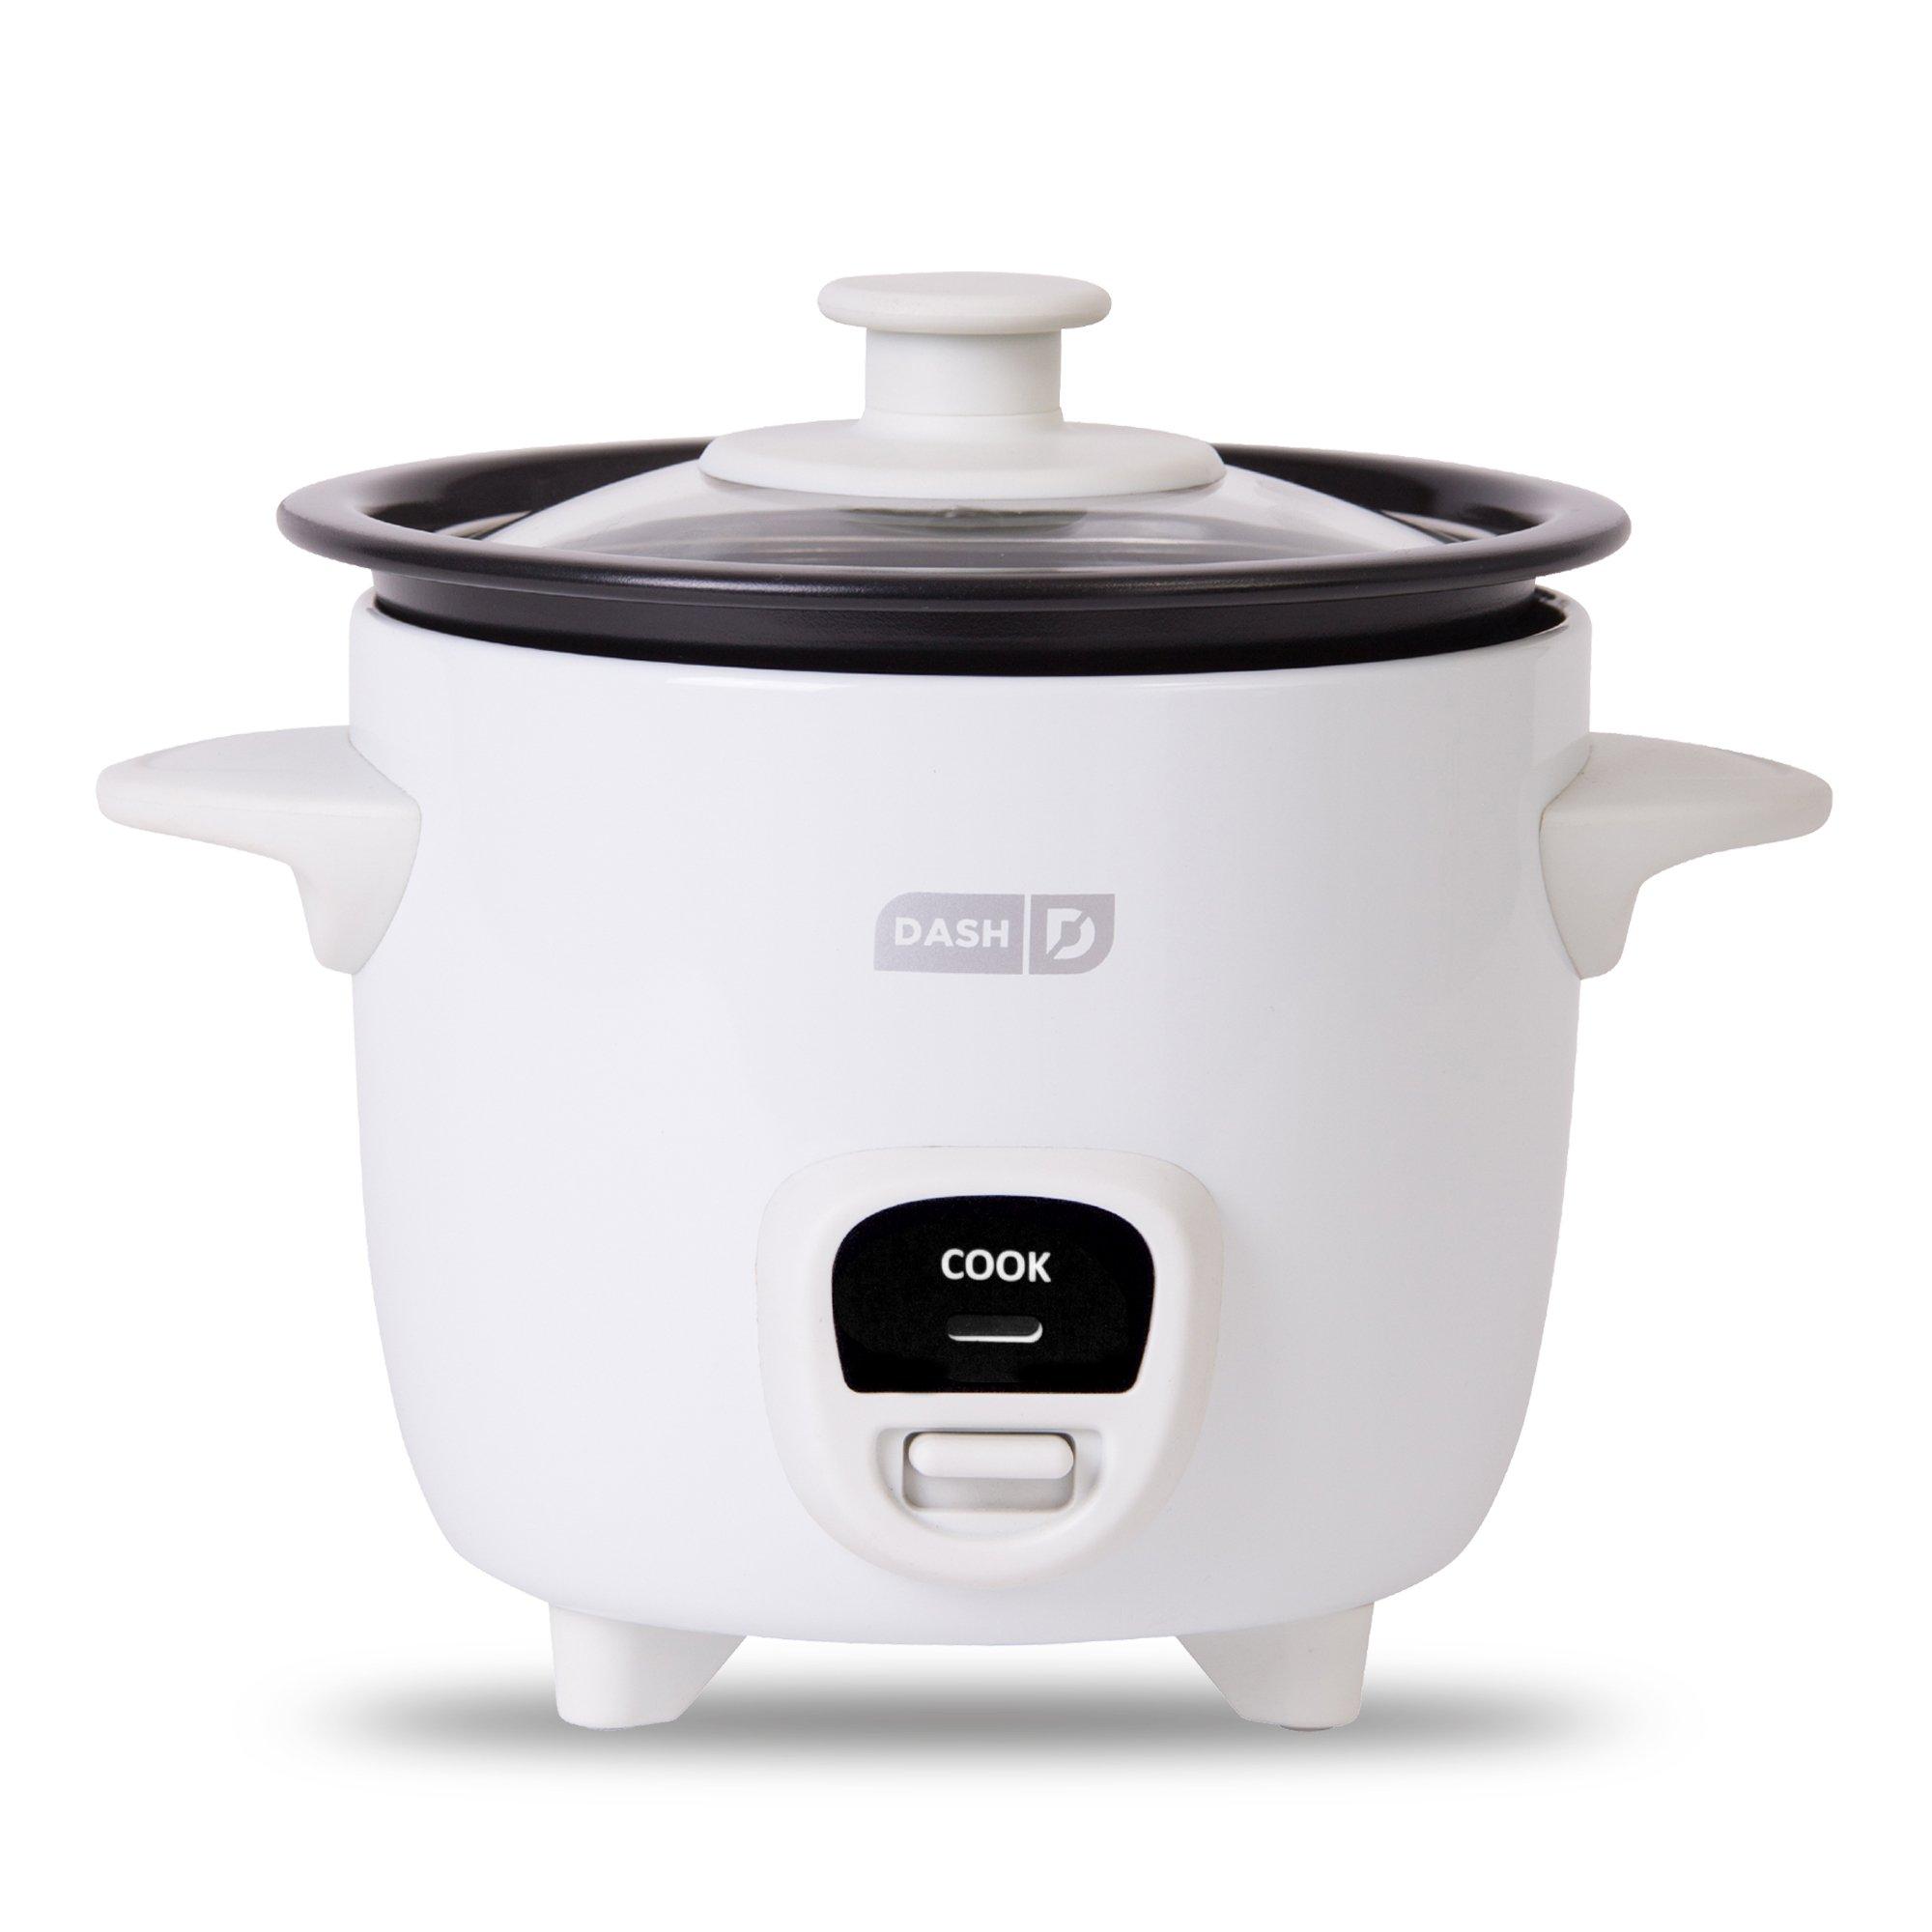 Dash DRCM100XXWH04 Rice Cooker, White